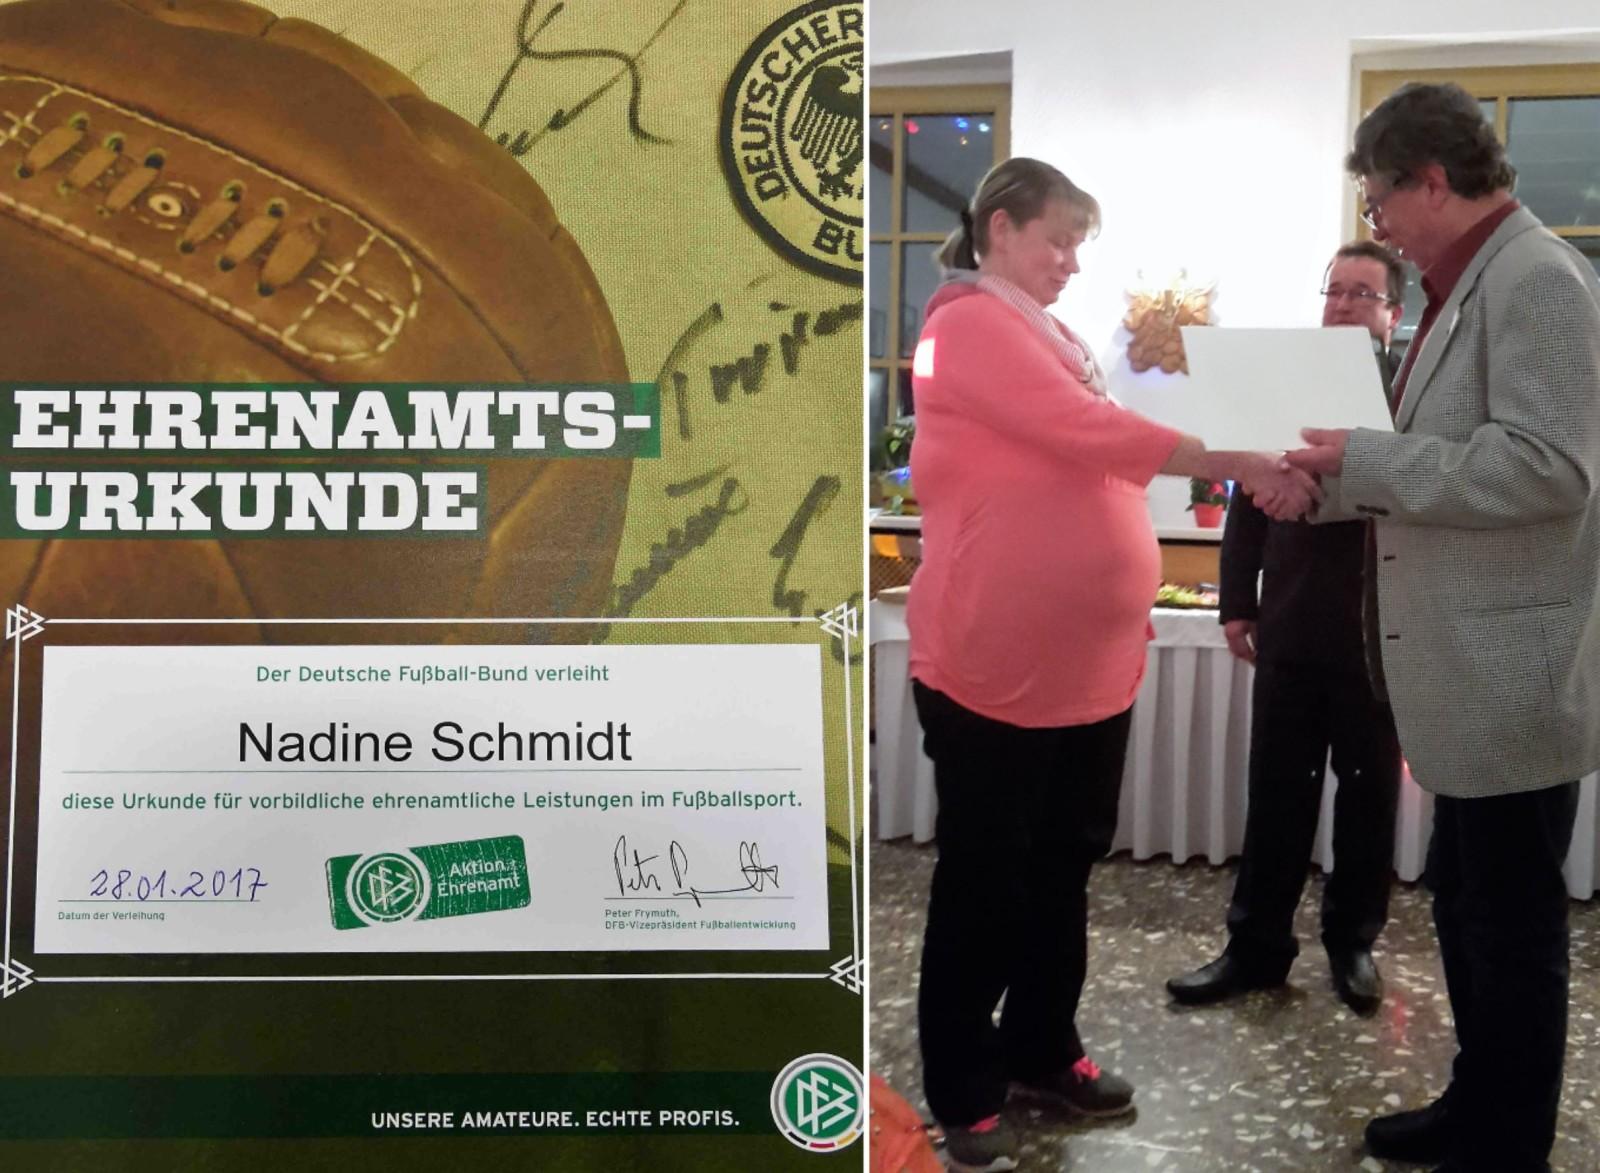 Nadine Ehrenurkunde DFB